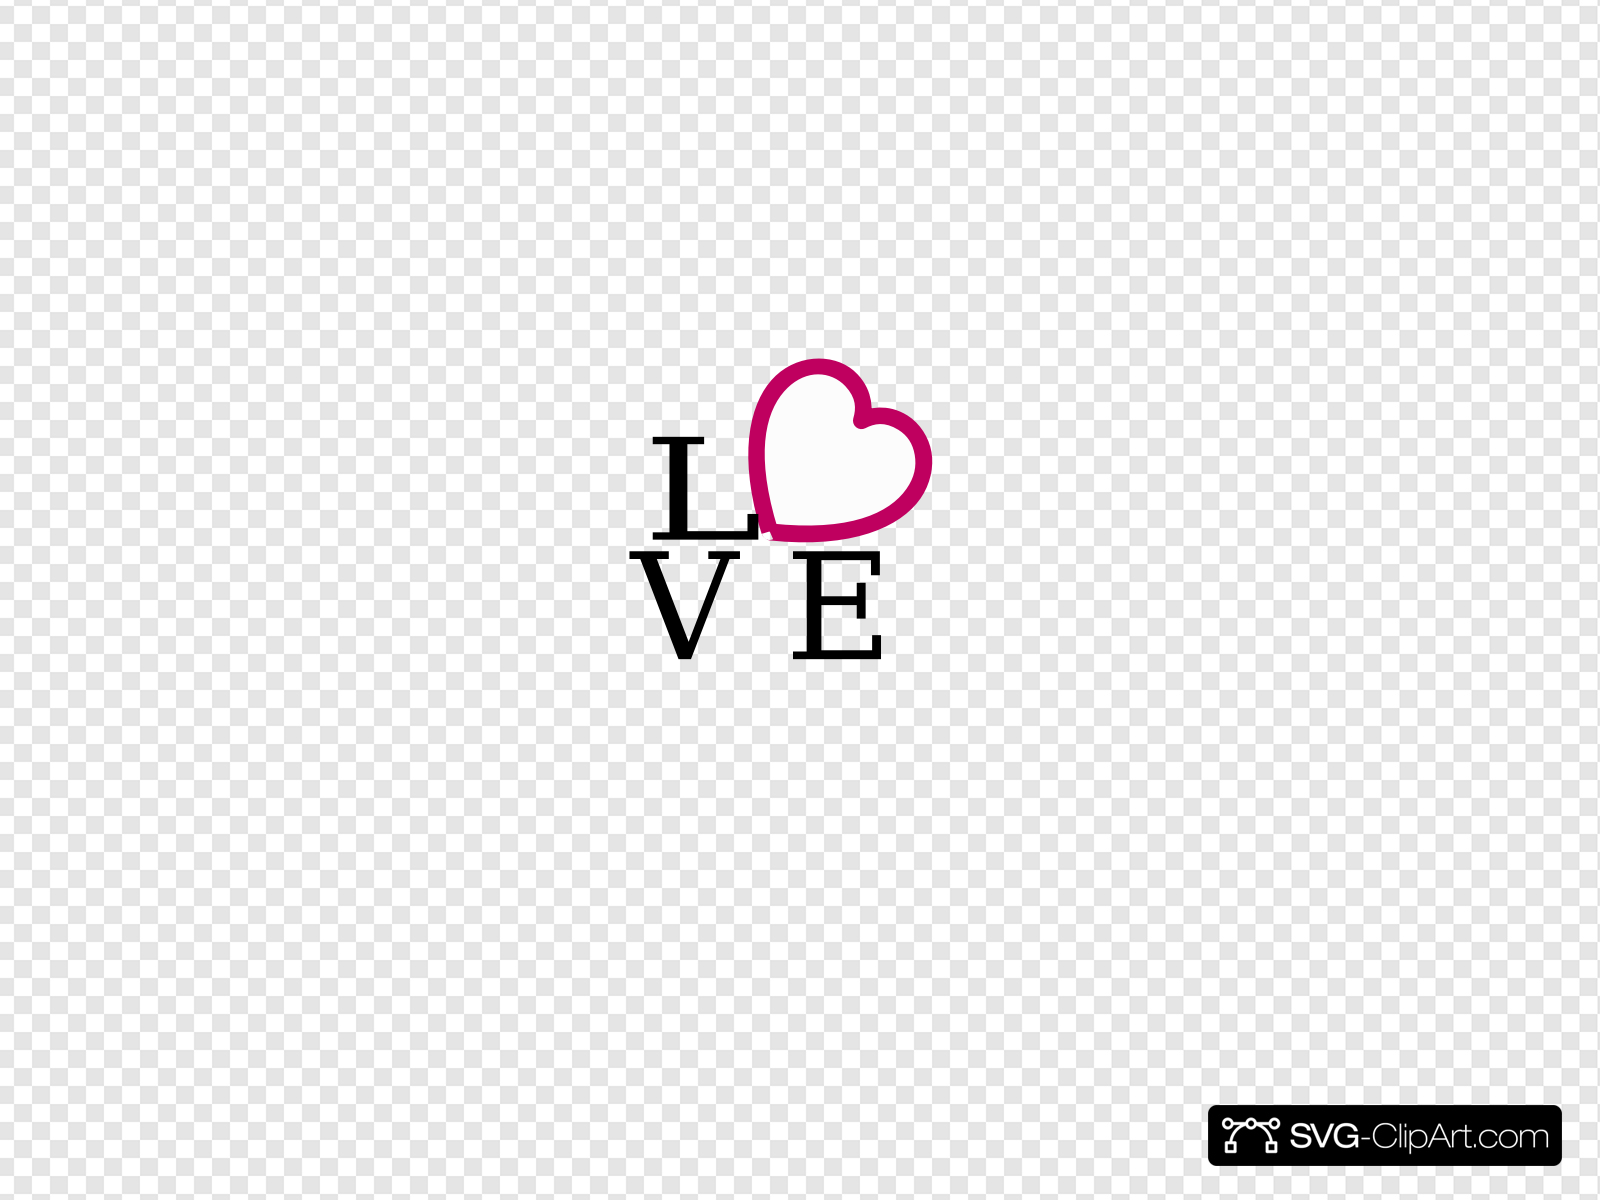 Love Logo Clip art, Icon and SVG.